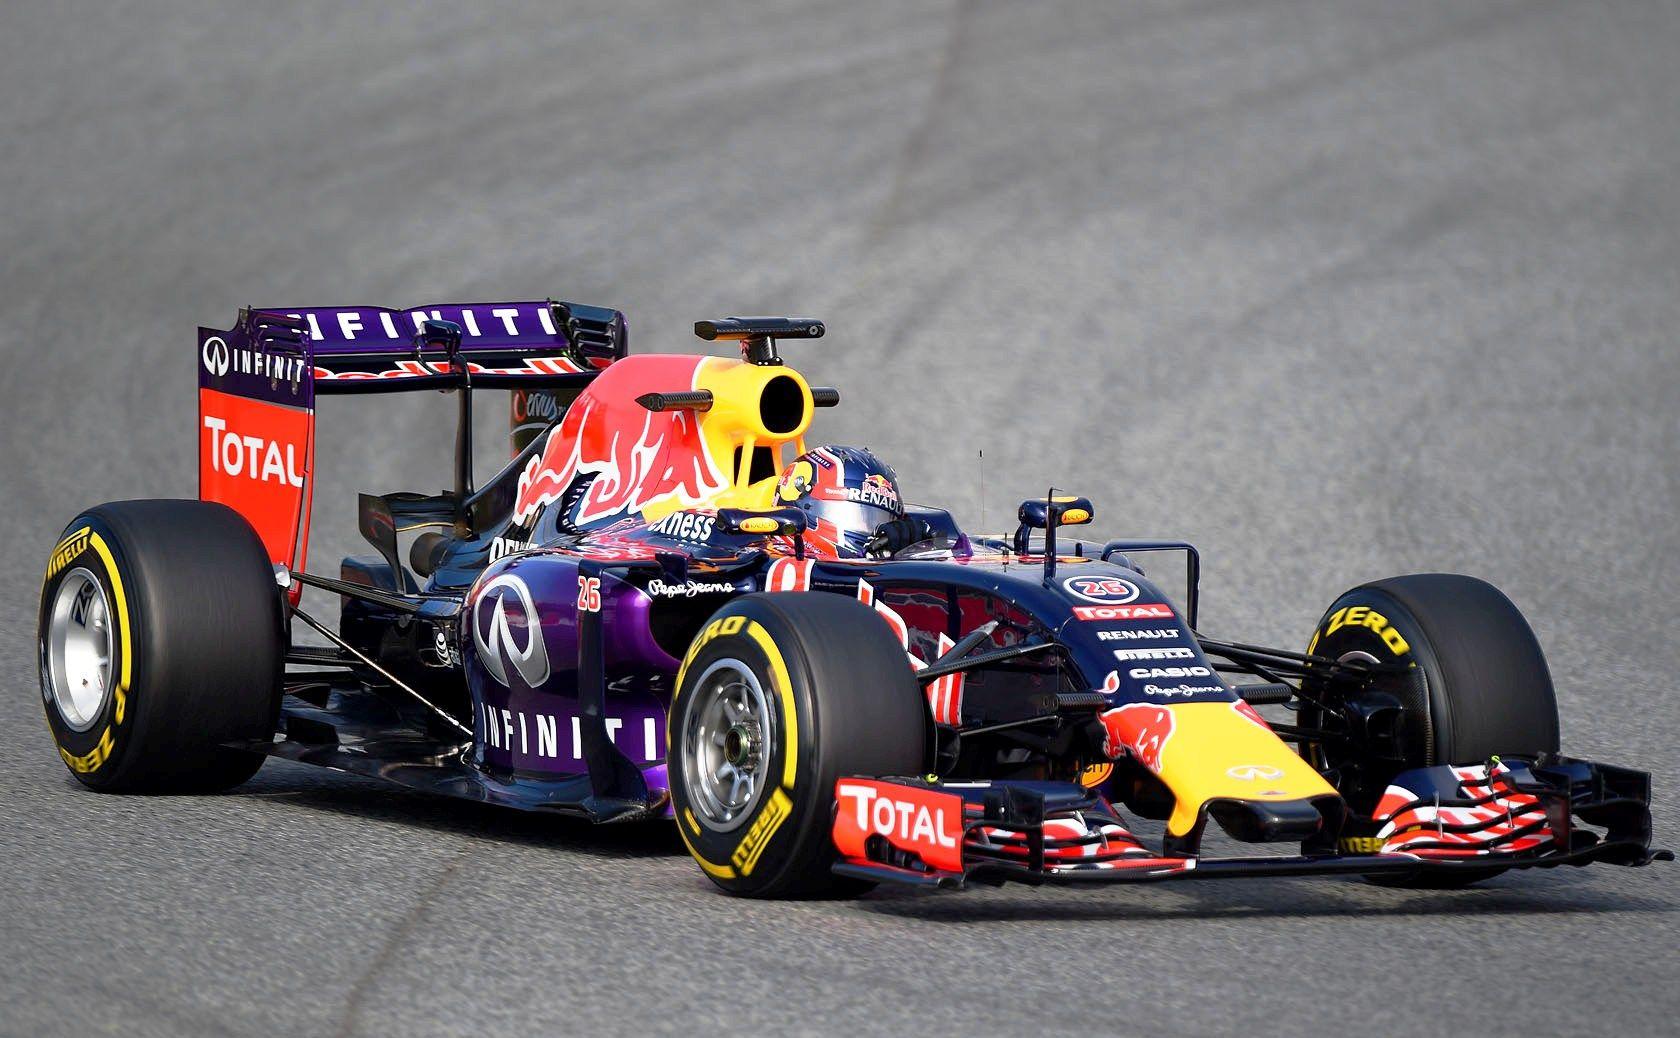 Pin di orlesovvieneilgiorno su Red Bull RB11 Adrian Newey